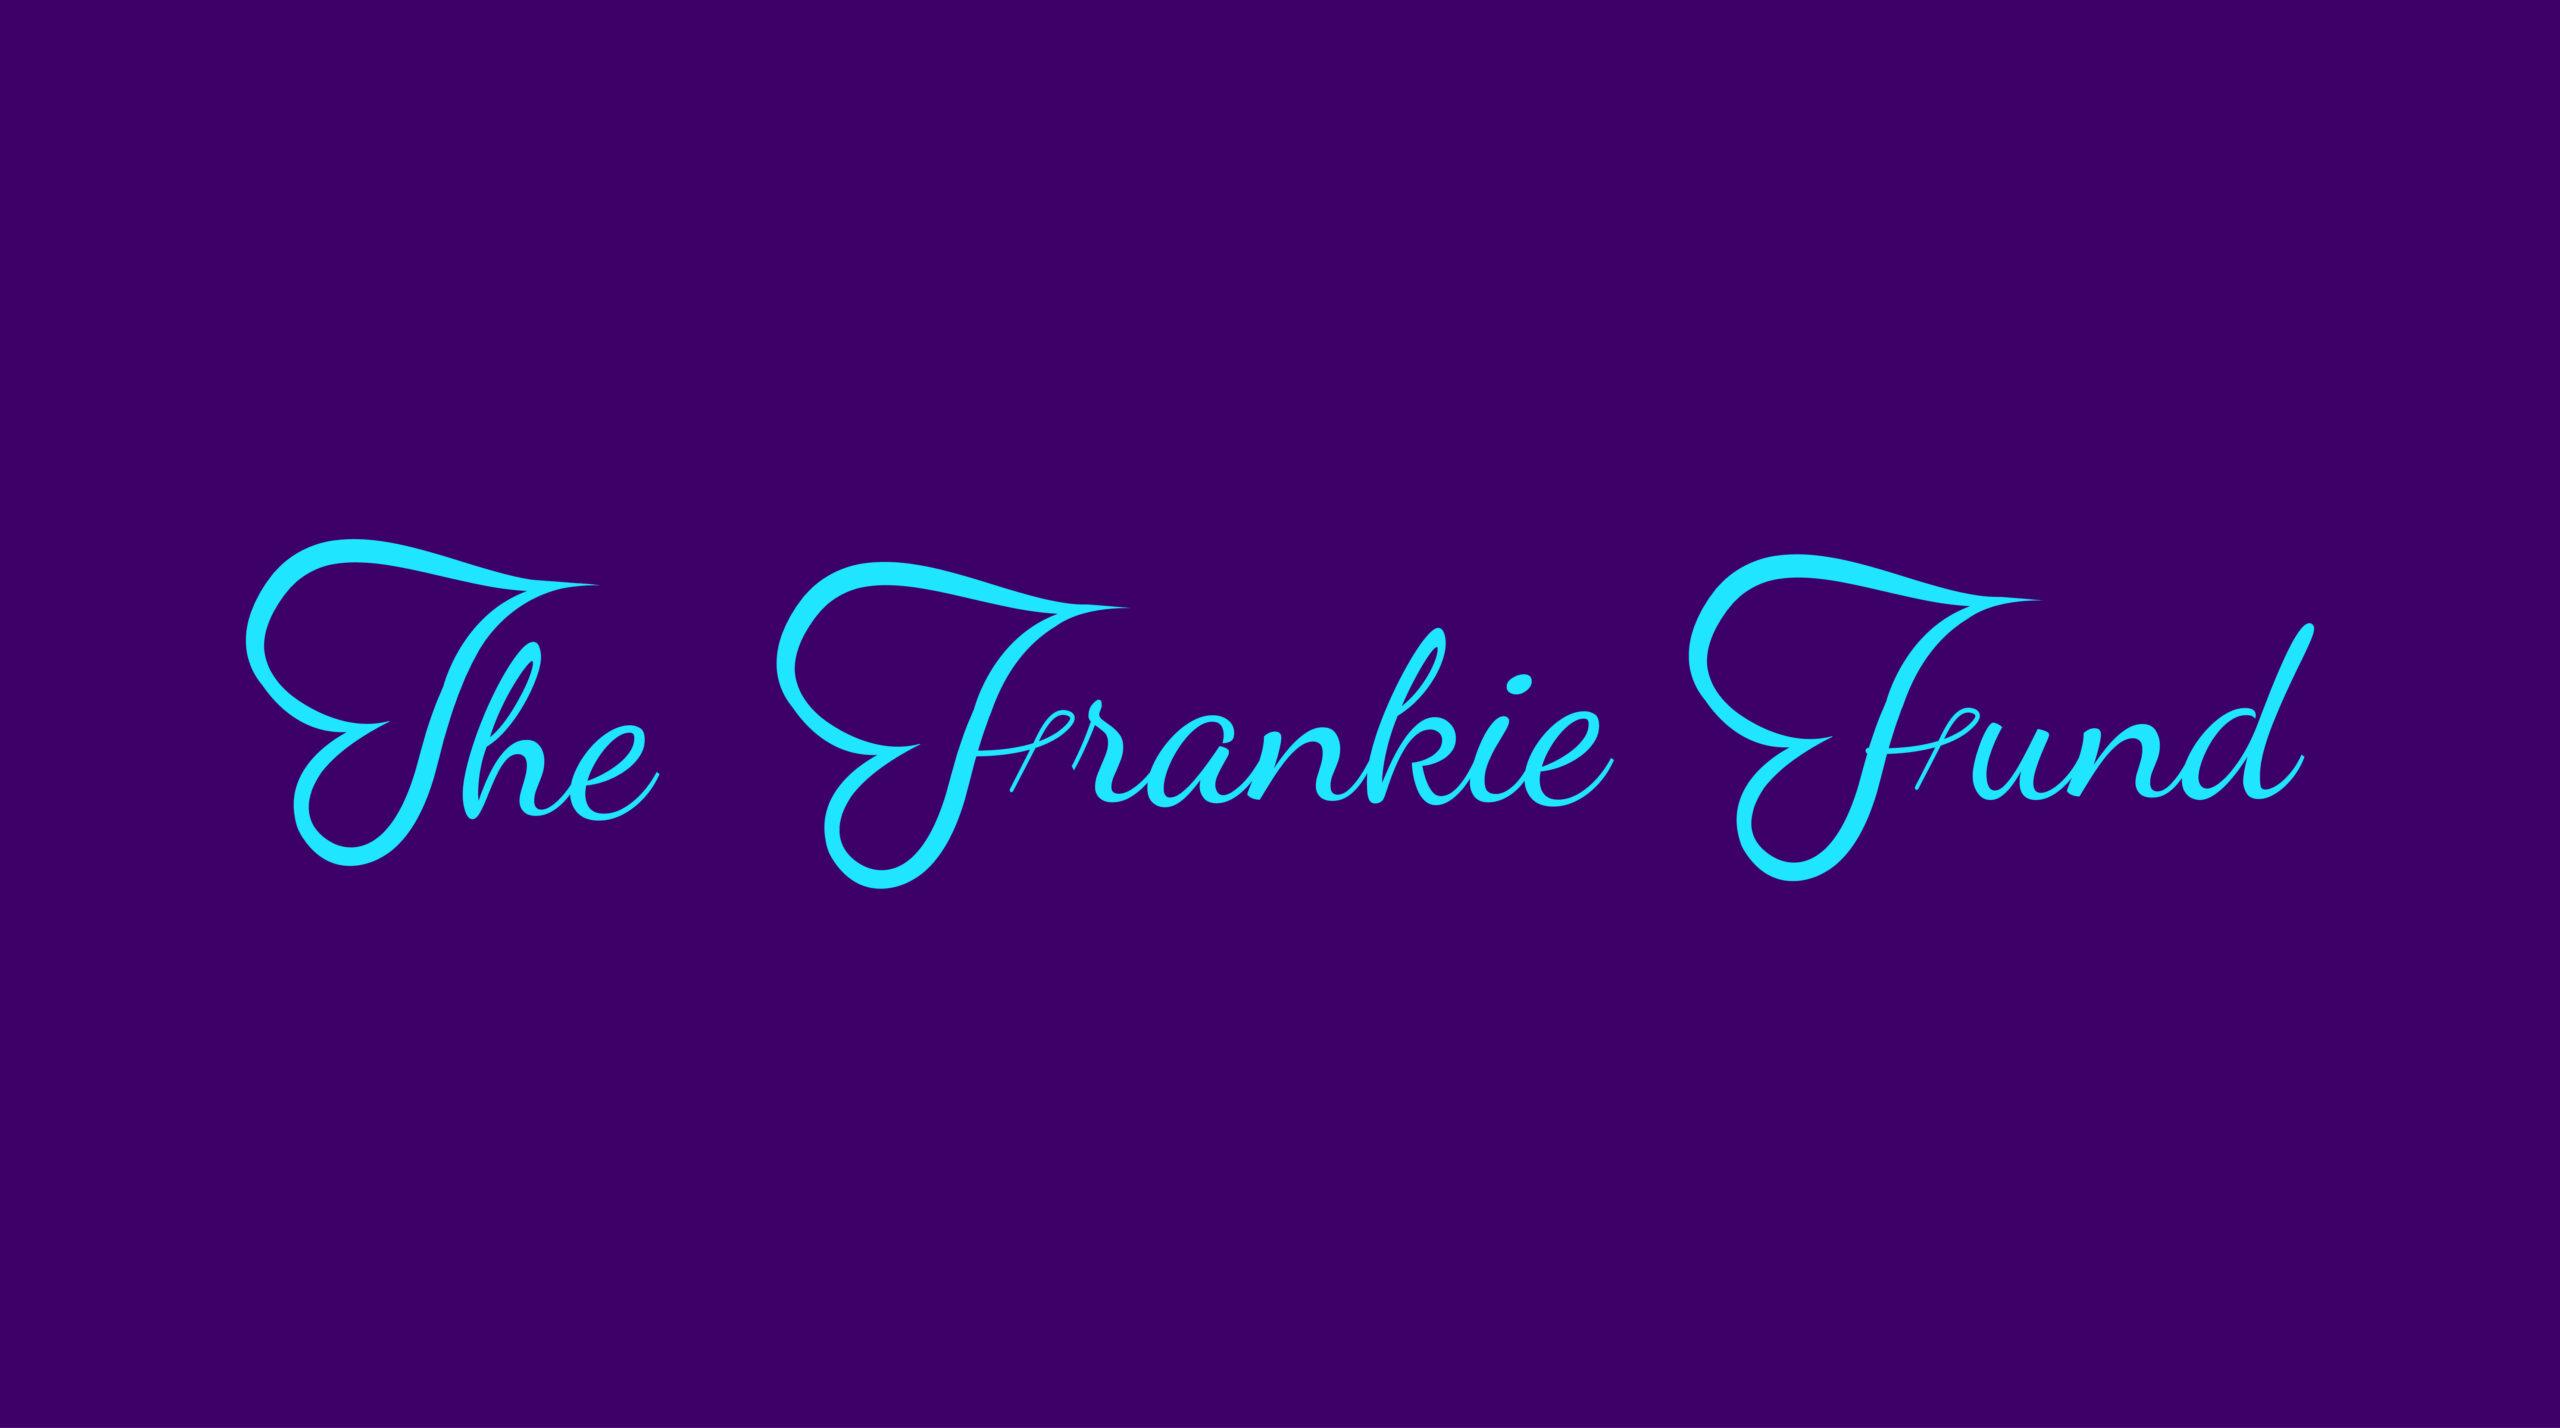 The Frankie Fund